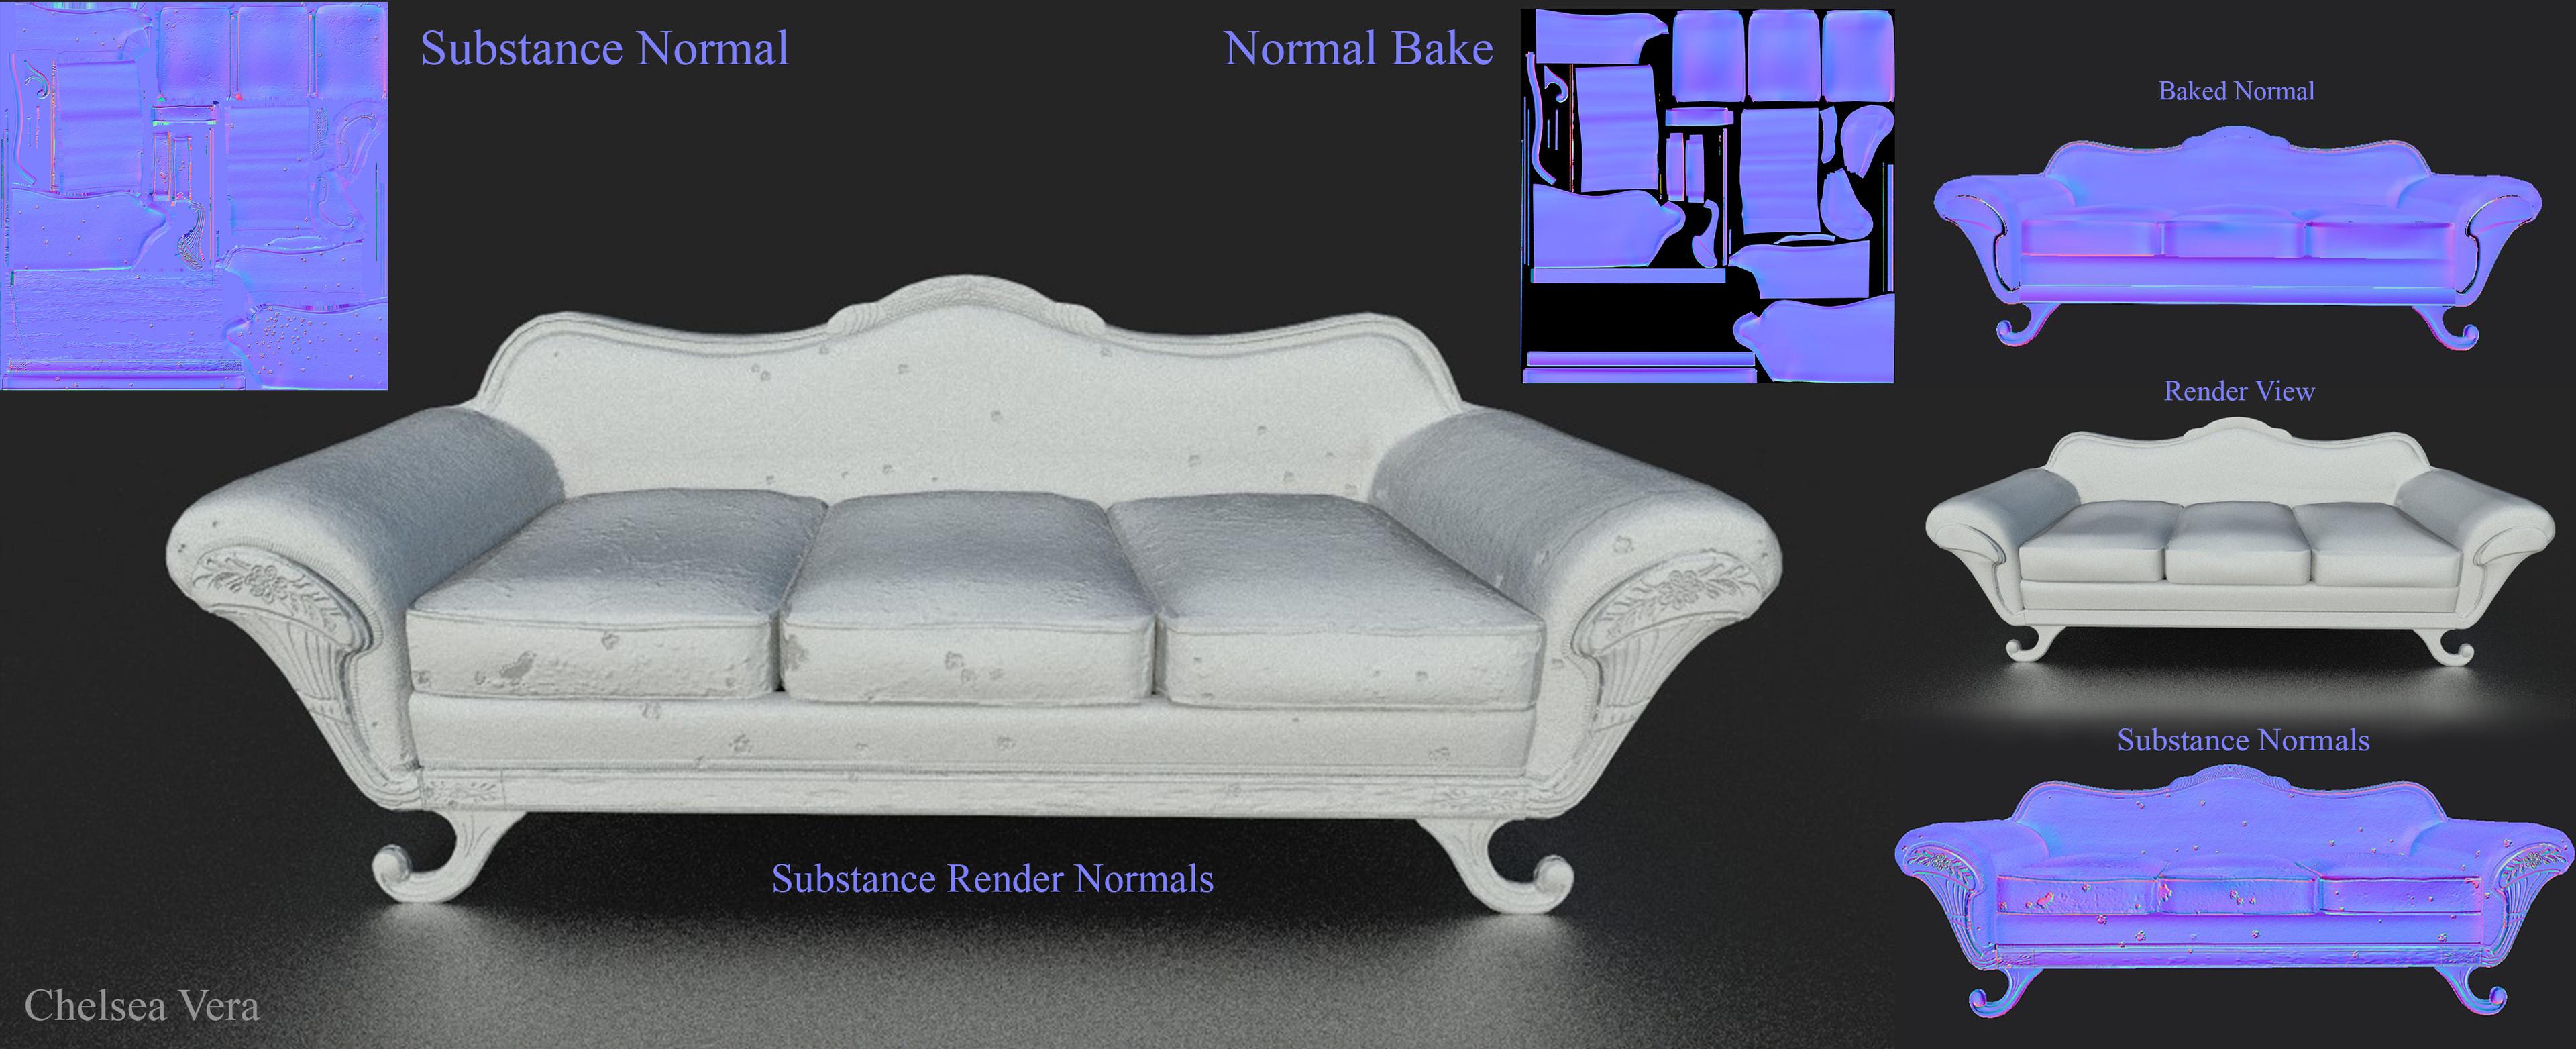 Normals Bake for wear n tear/ Clean pass